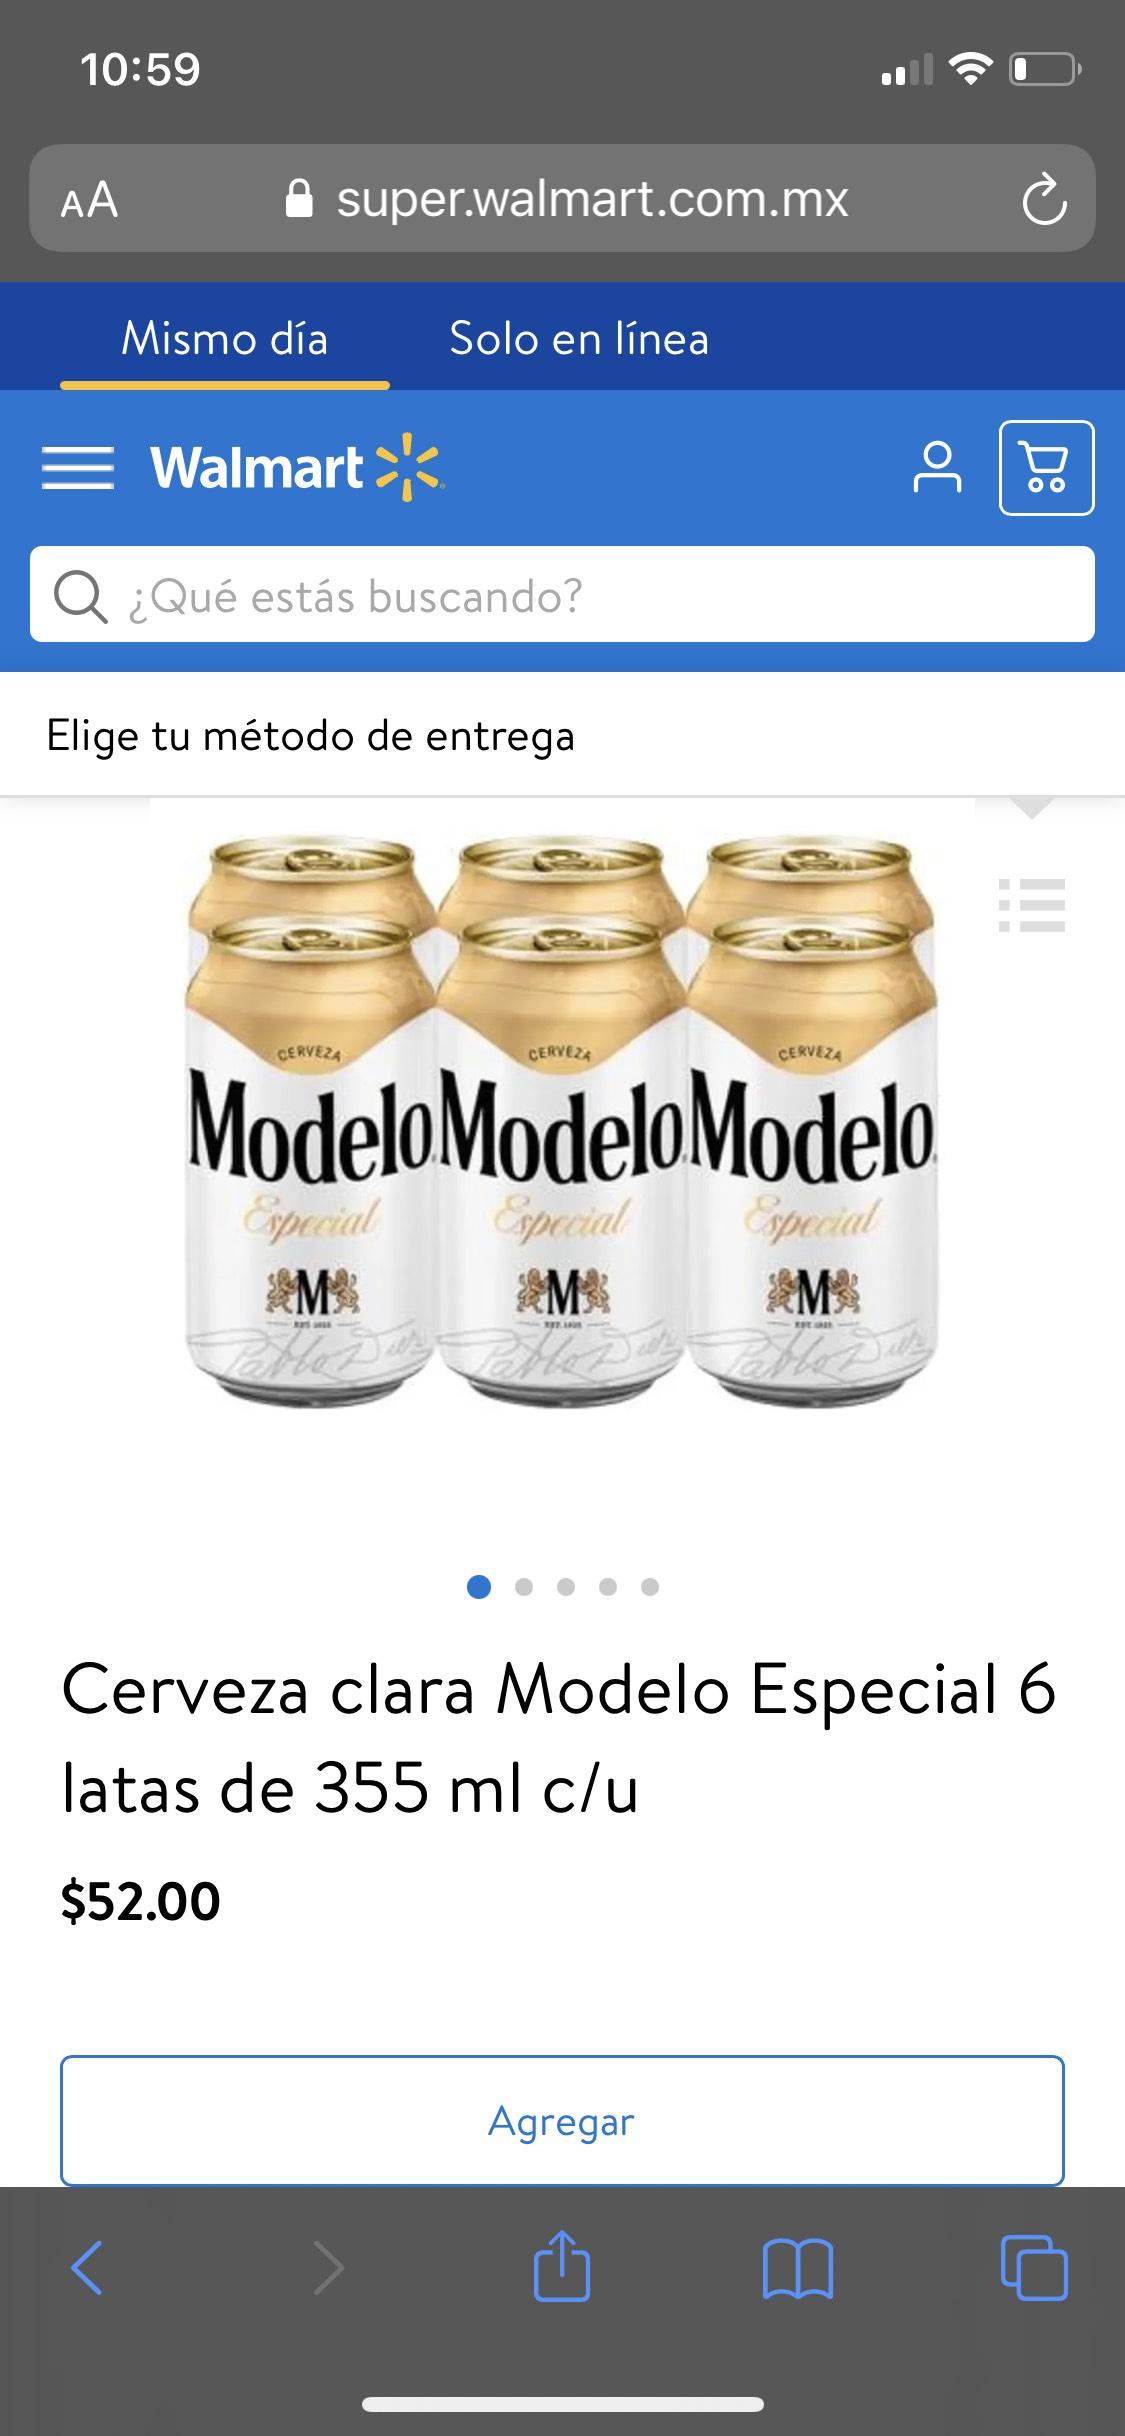 Walmart: Cerveza clara Modelo Especial 6 latas de 355 ml c/u